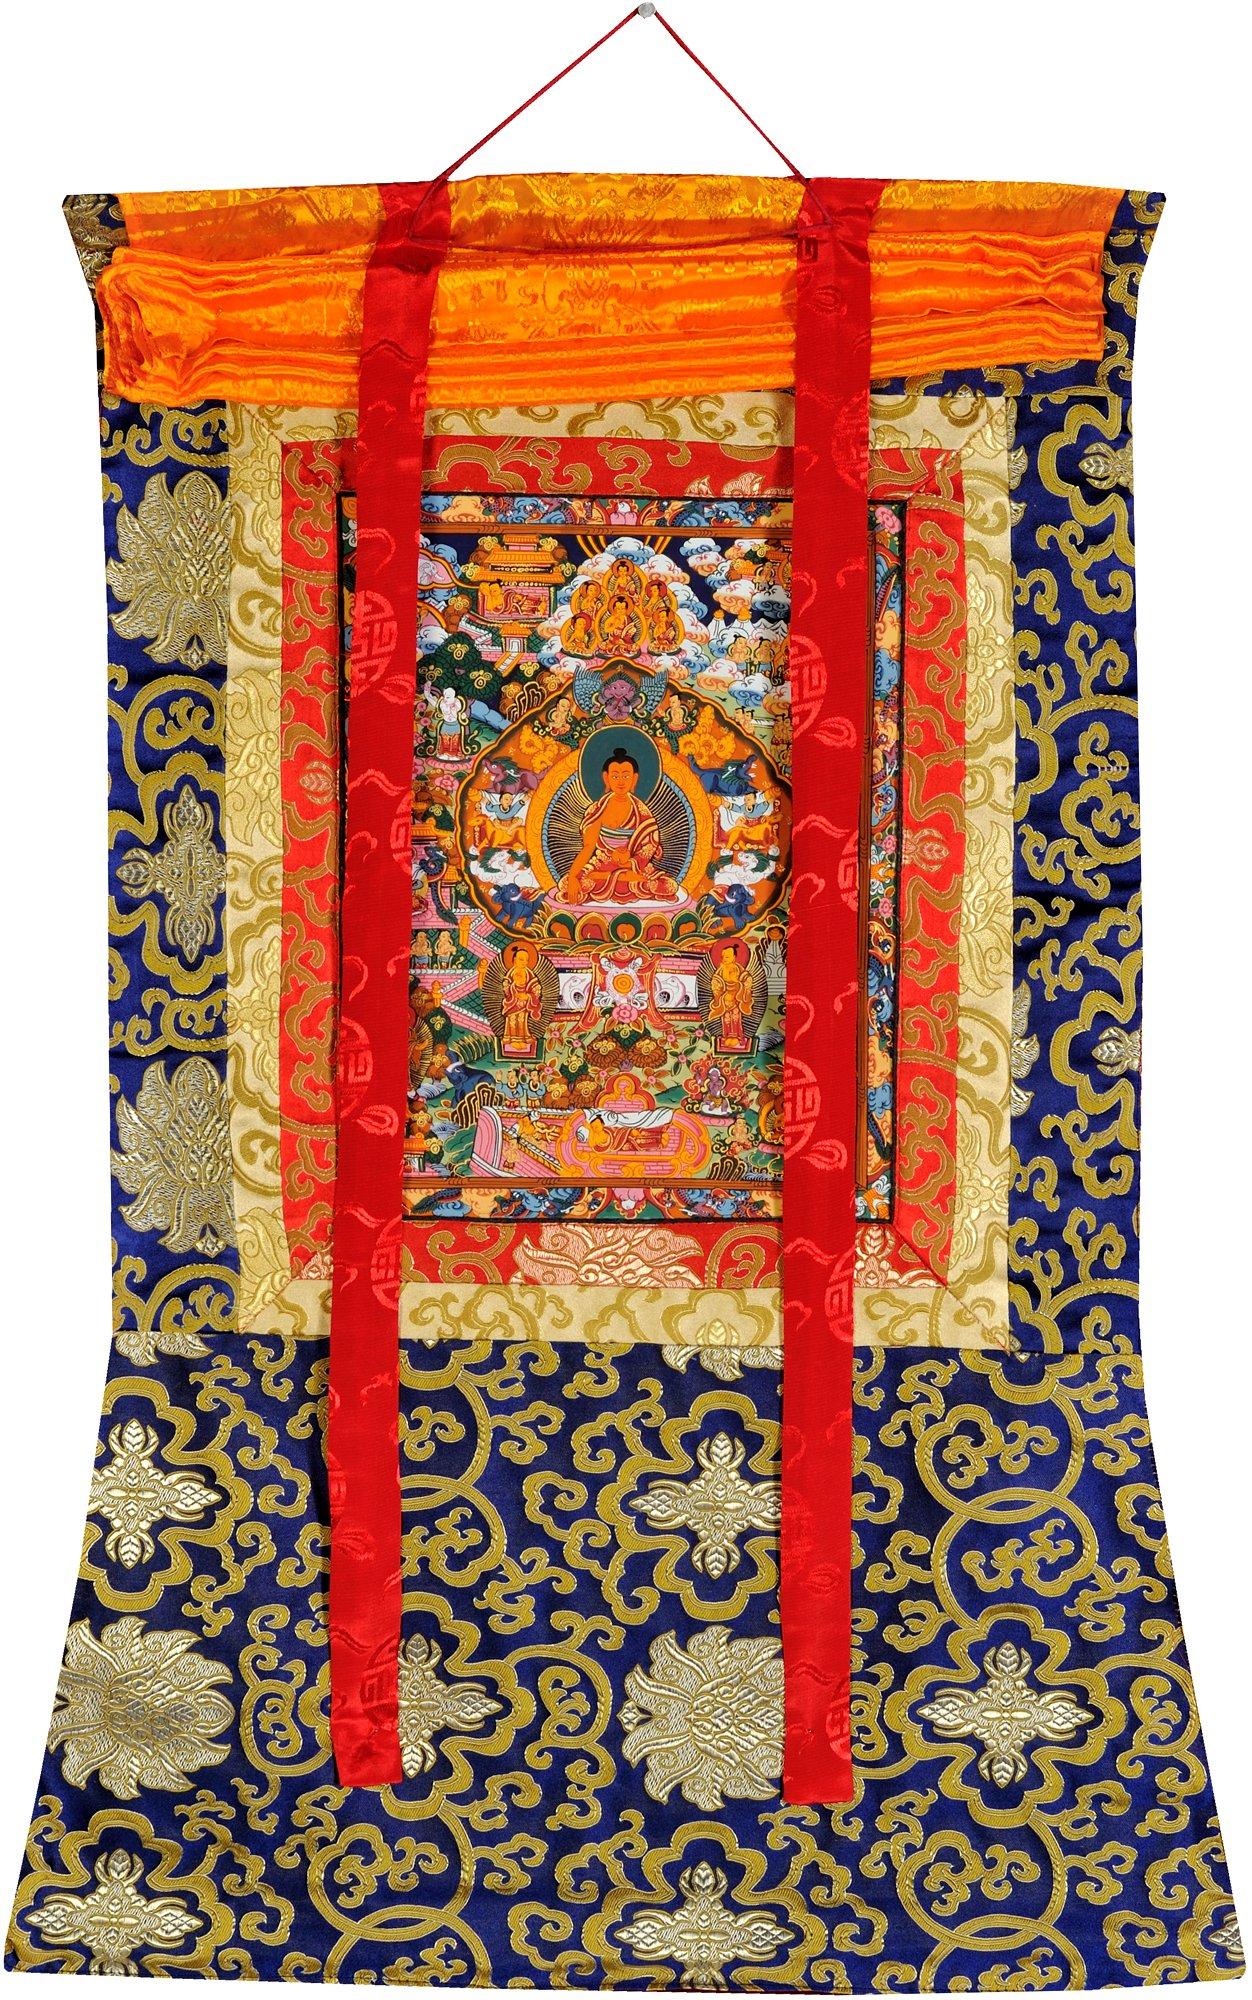 Gautam Buddha with Scenes from His Life (Tibetan Buddhist) - Tibetan Thangka Painting by Exotic India (Image #2)